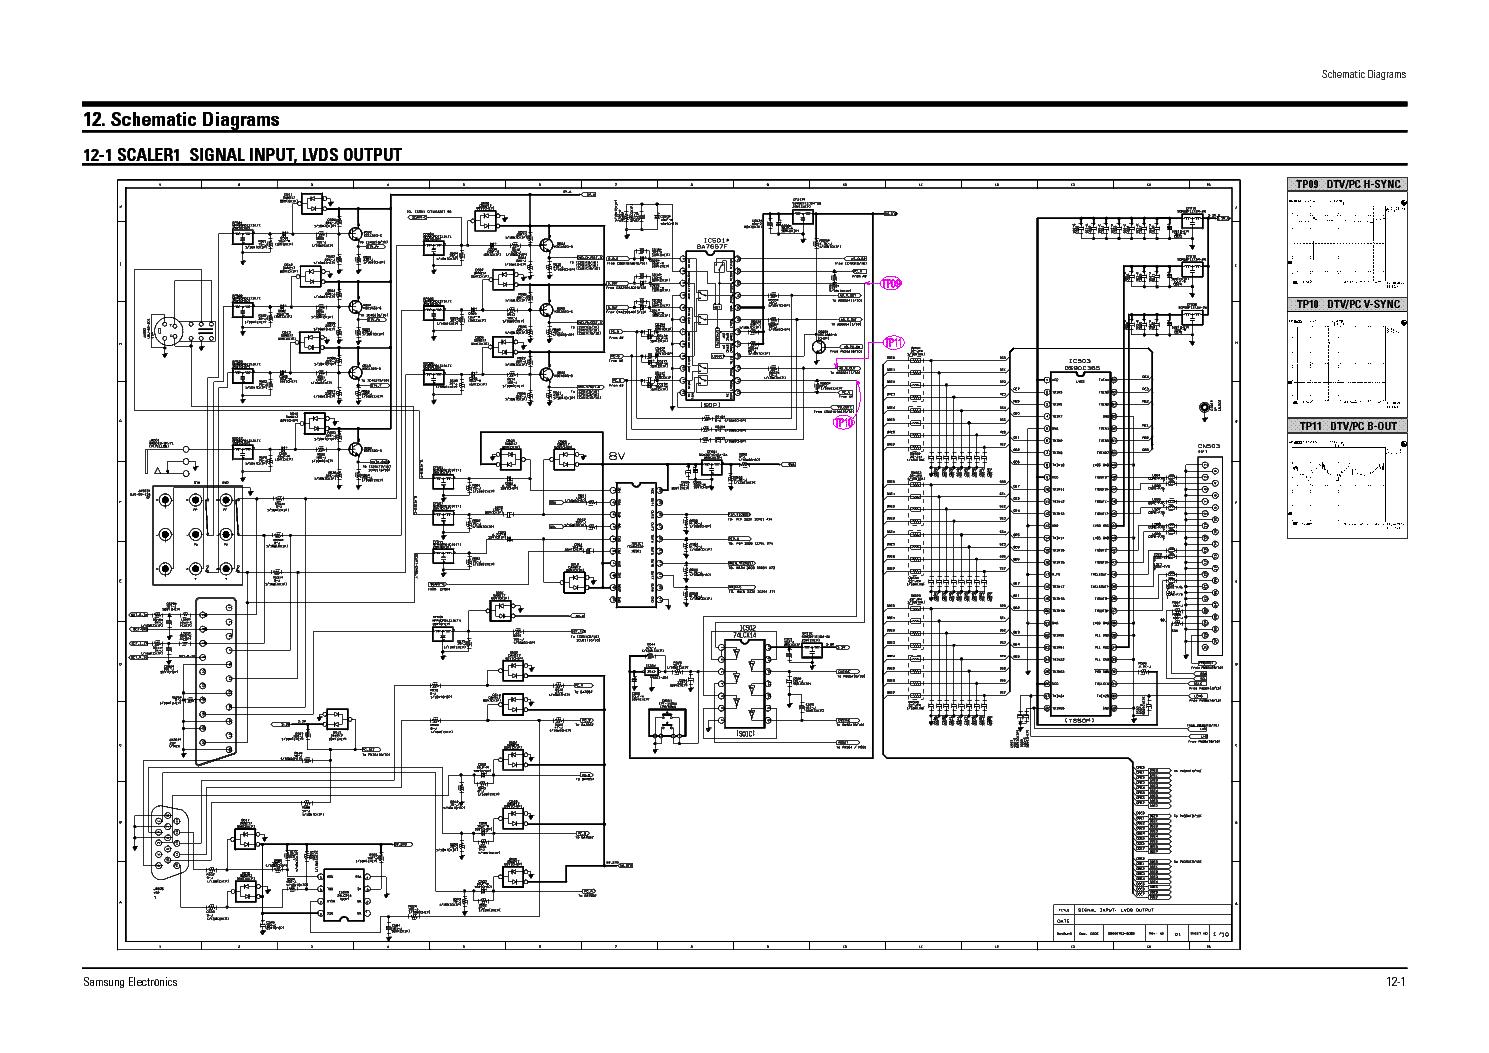 hight resolution of tv schematic diagram furthermore led tv schematic diagram on tvtv schematic wiring diagram technic samsung tv